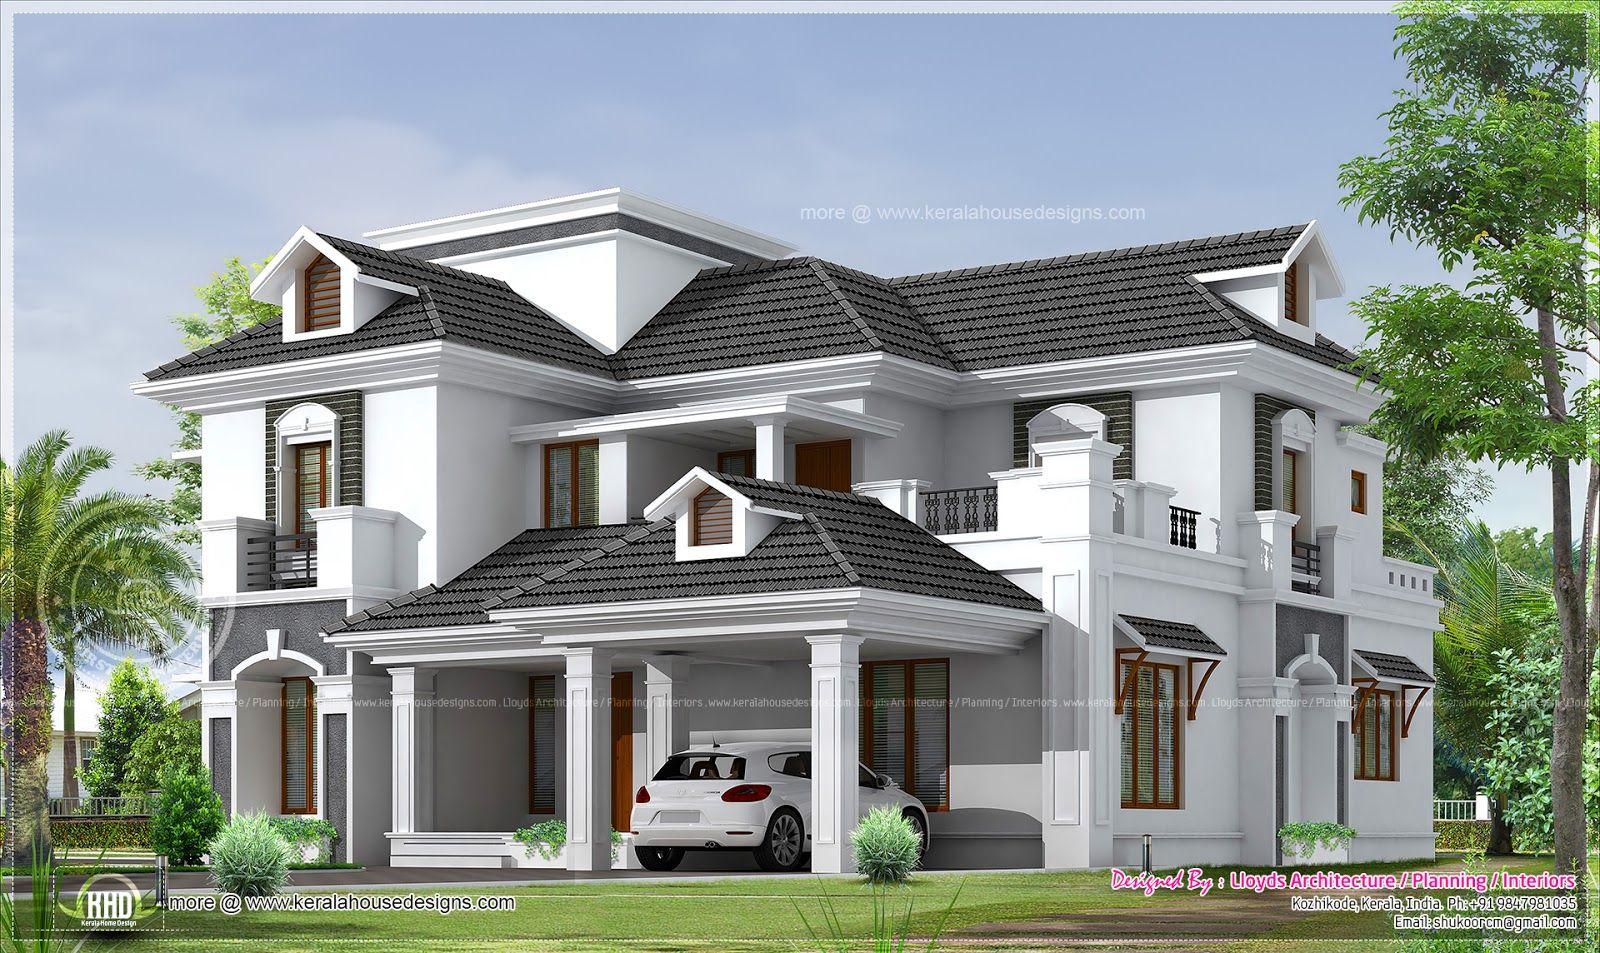 4 Bedroom Bungalow Design Entrancing Bedroom House Design Apartment Plans  Home Design  Pinterest Review